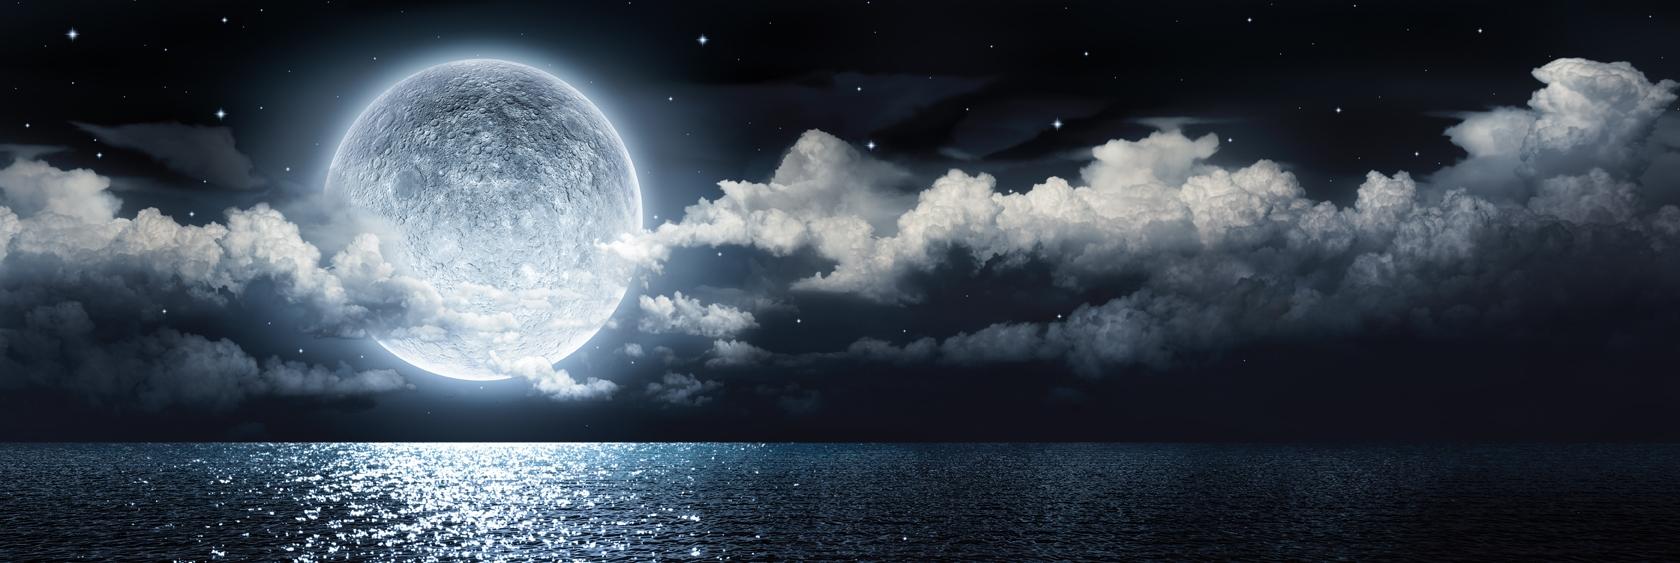 Watery Full Moon